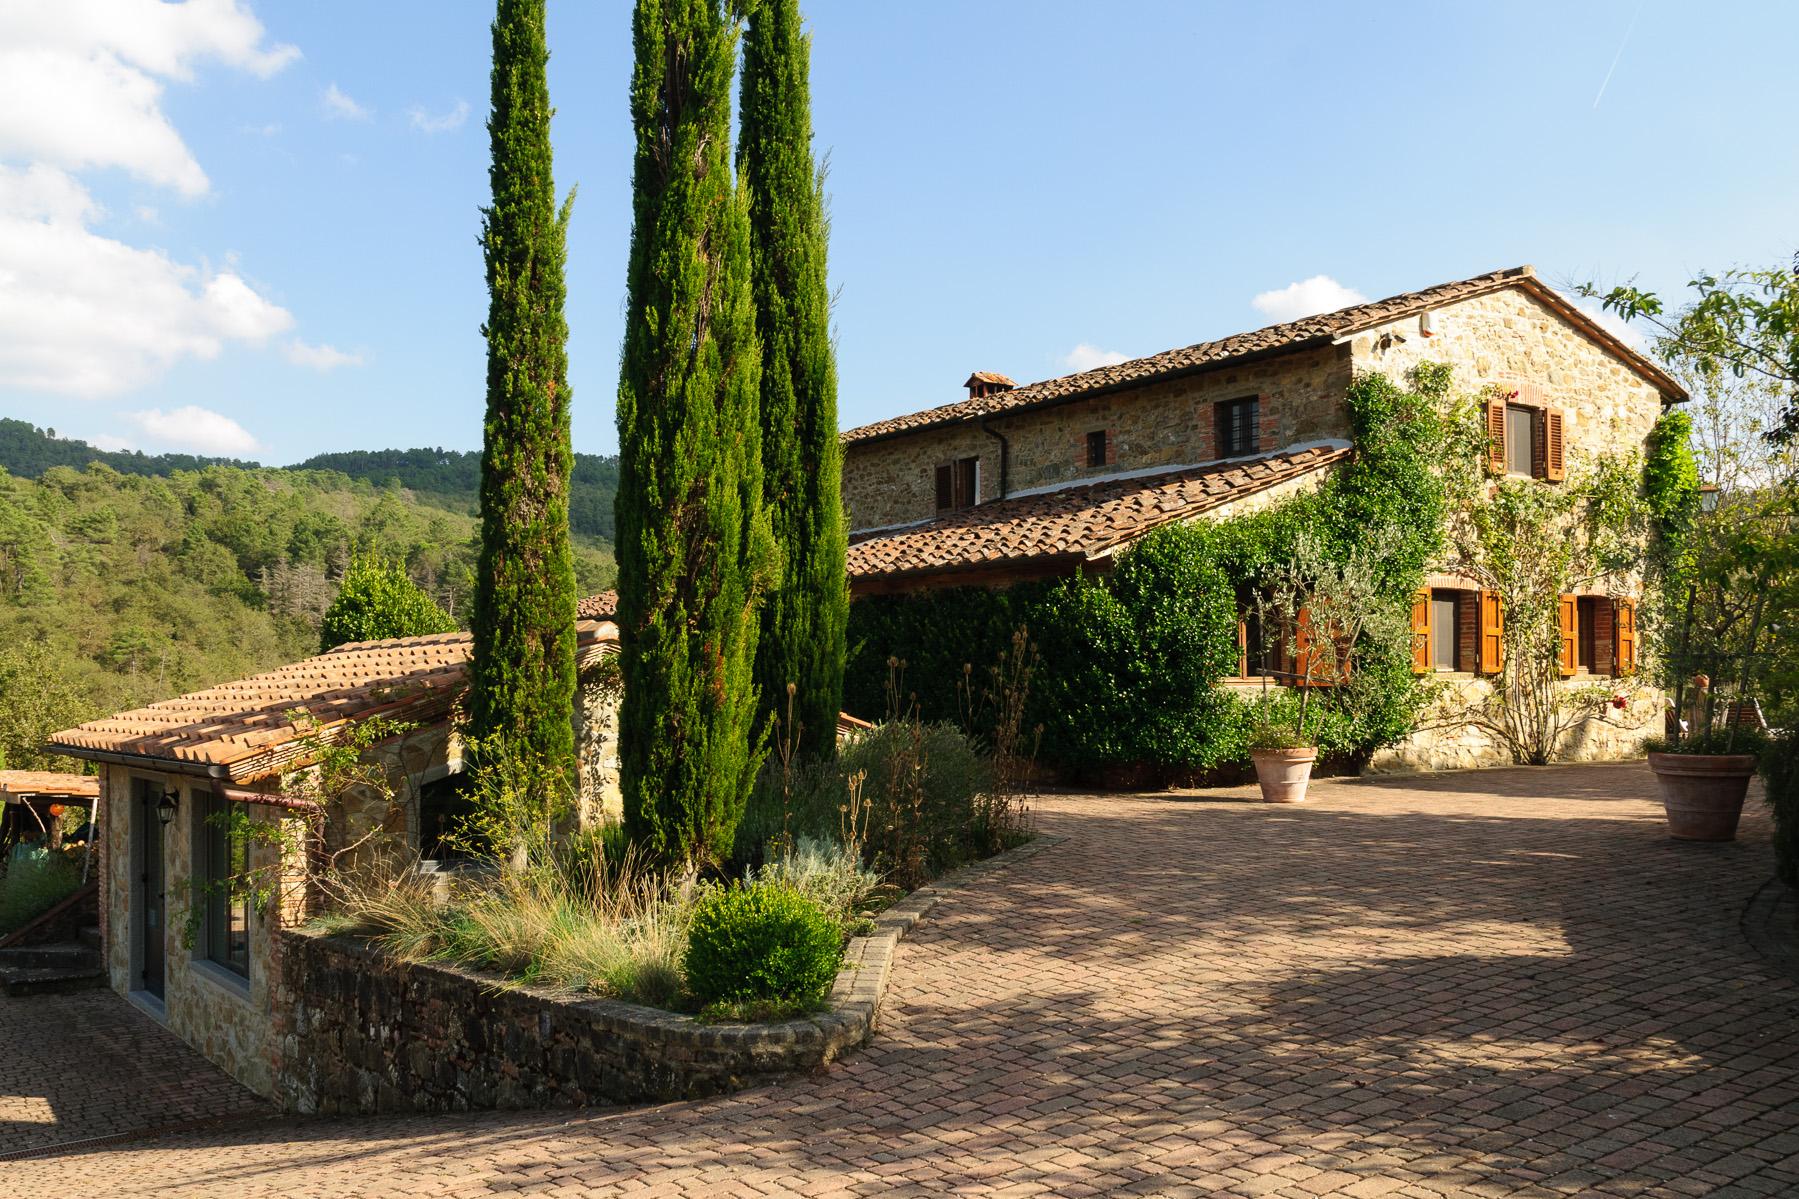 独户住宅 为 销售 在 Country Retreat in Chianti Classico Siena, Siena 意大利